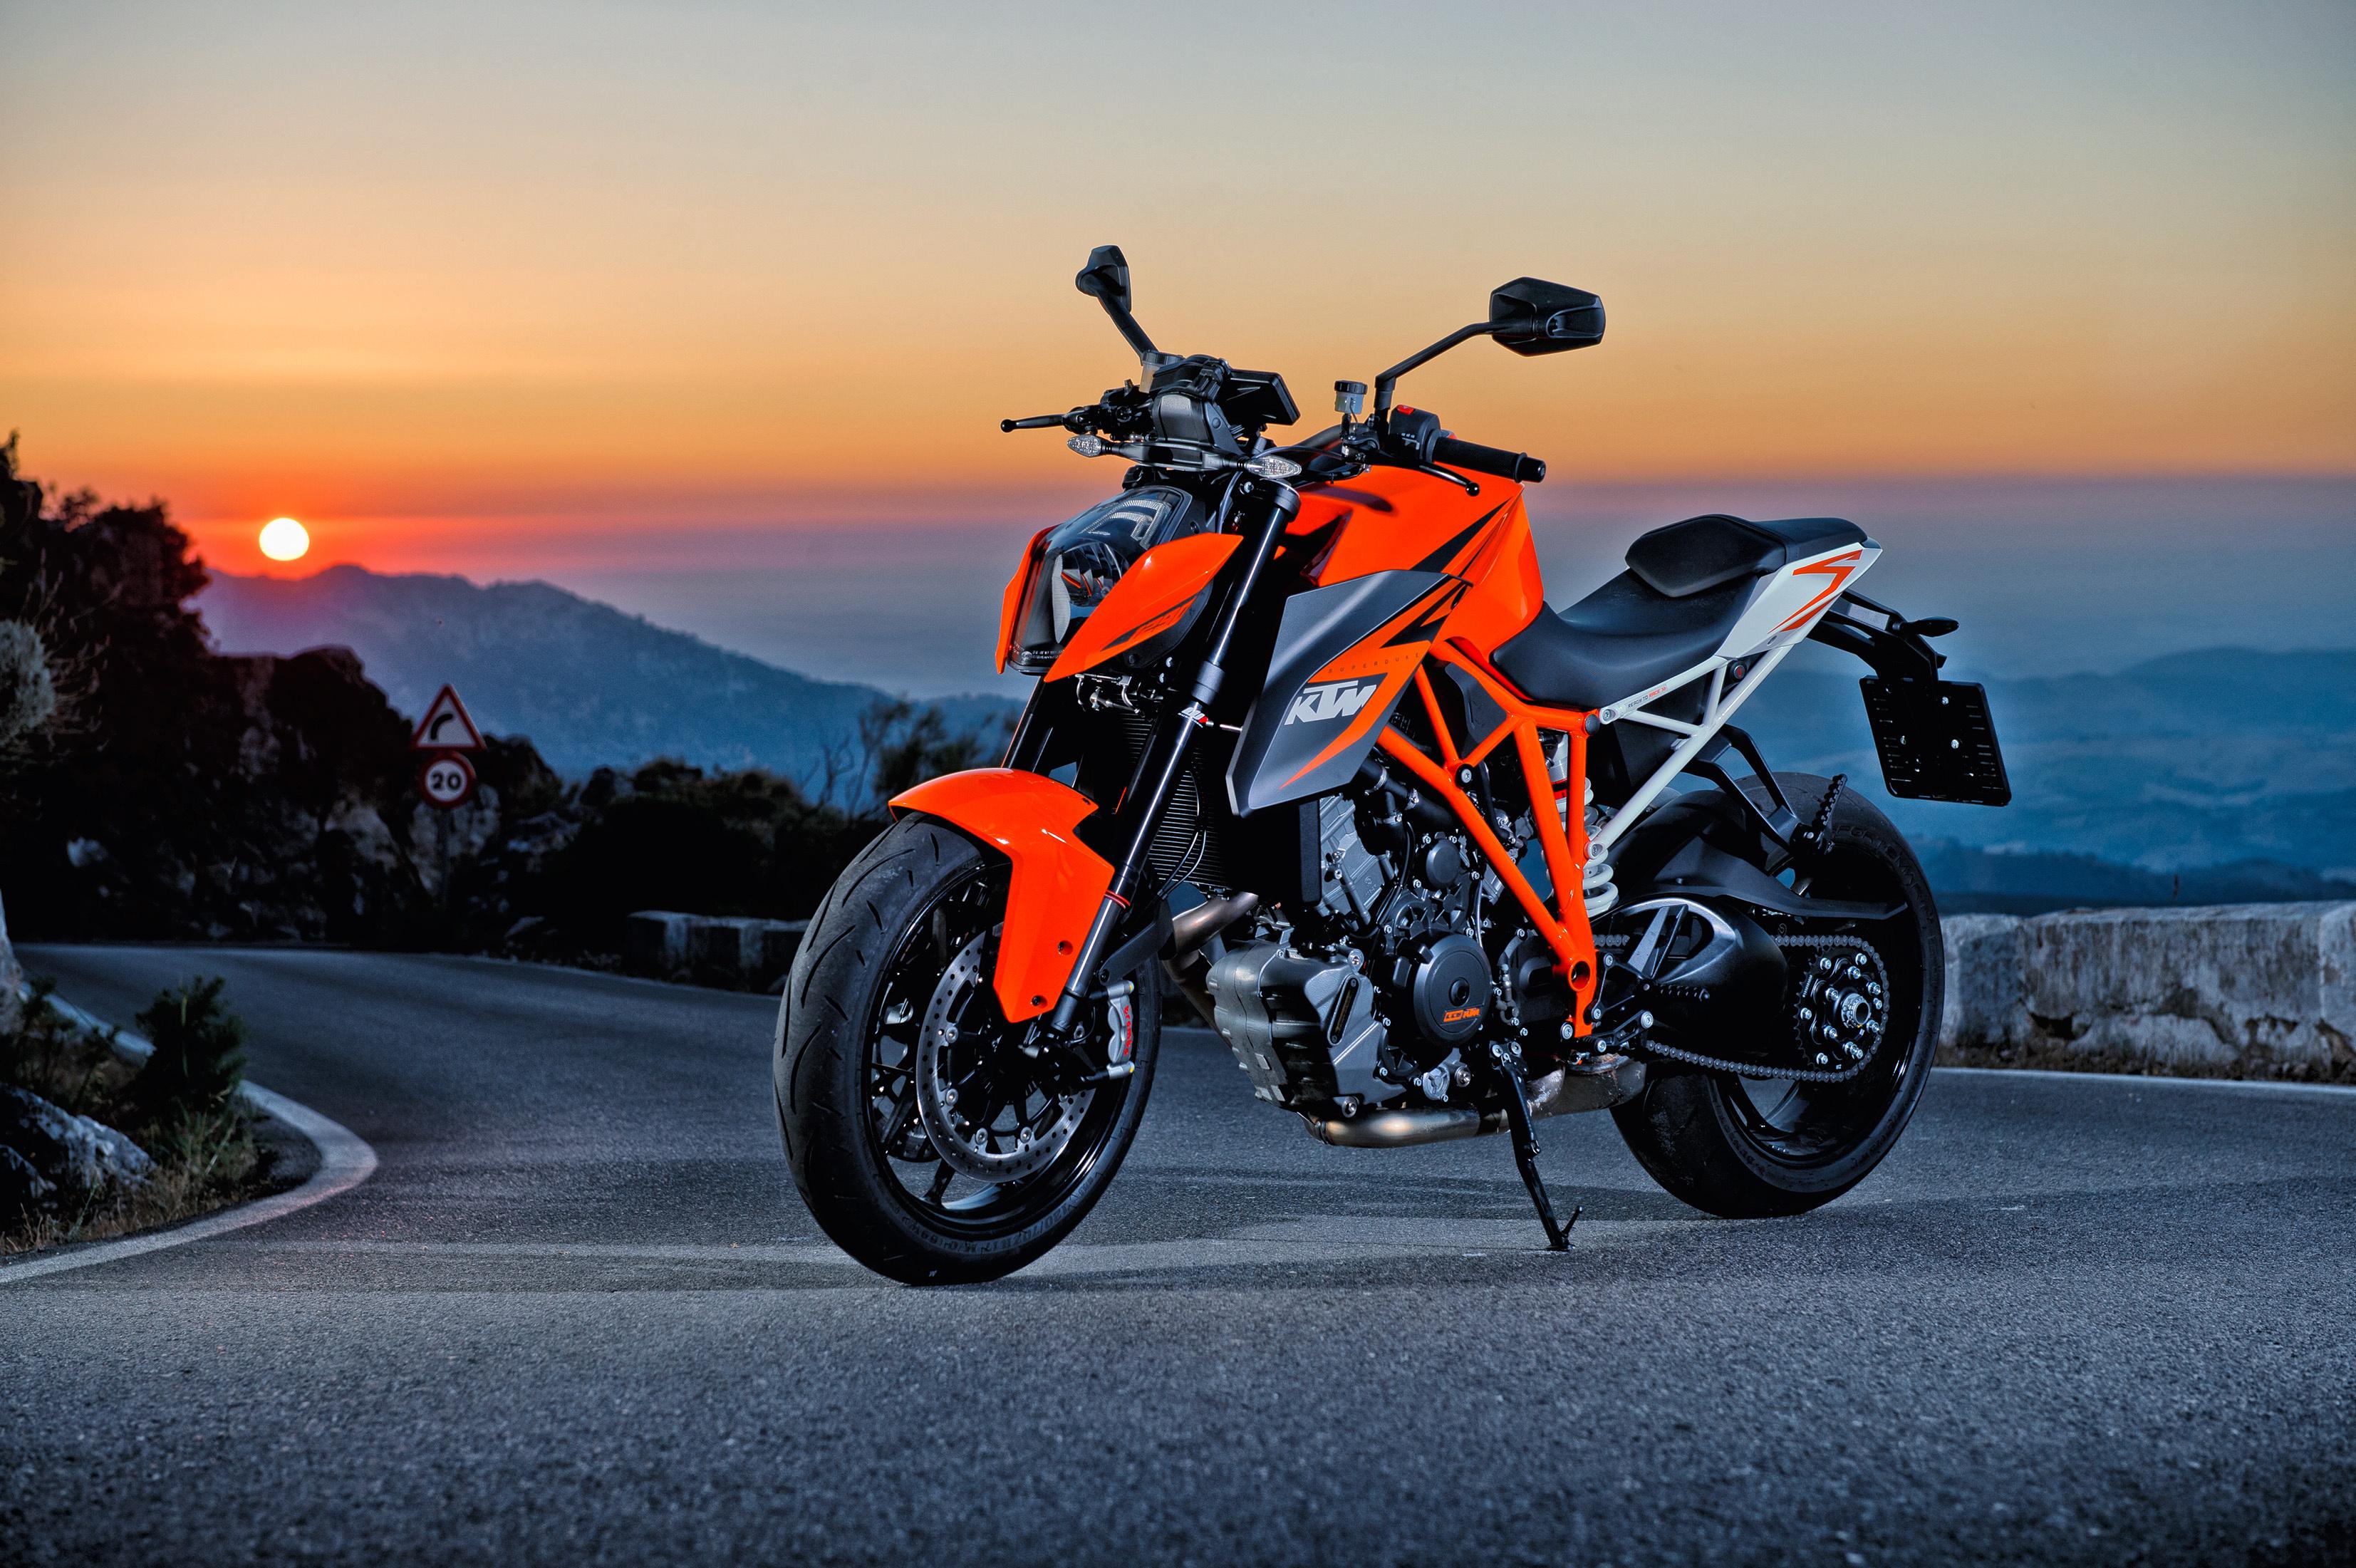 Download Wallpaper sunset bike motorcycle ktm 1290 super duke r 3307x2201